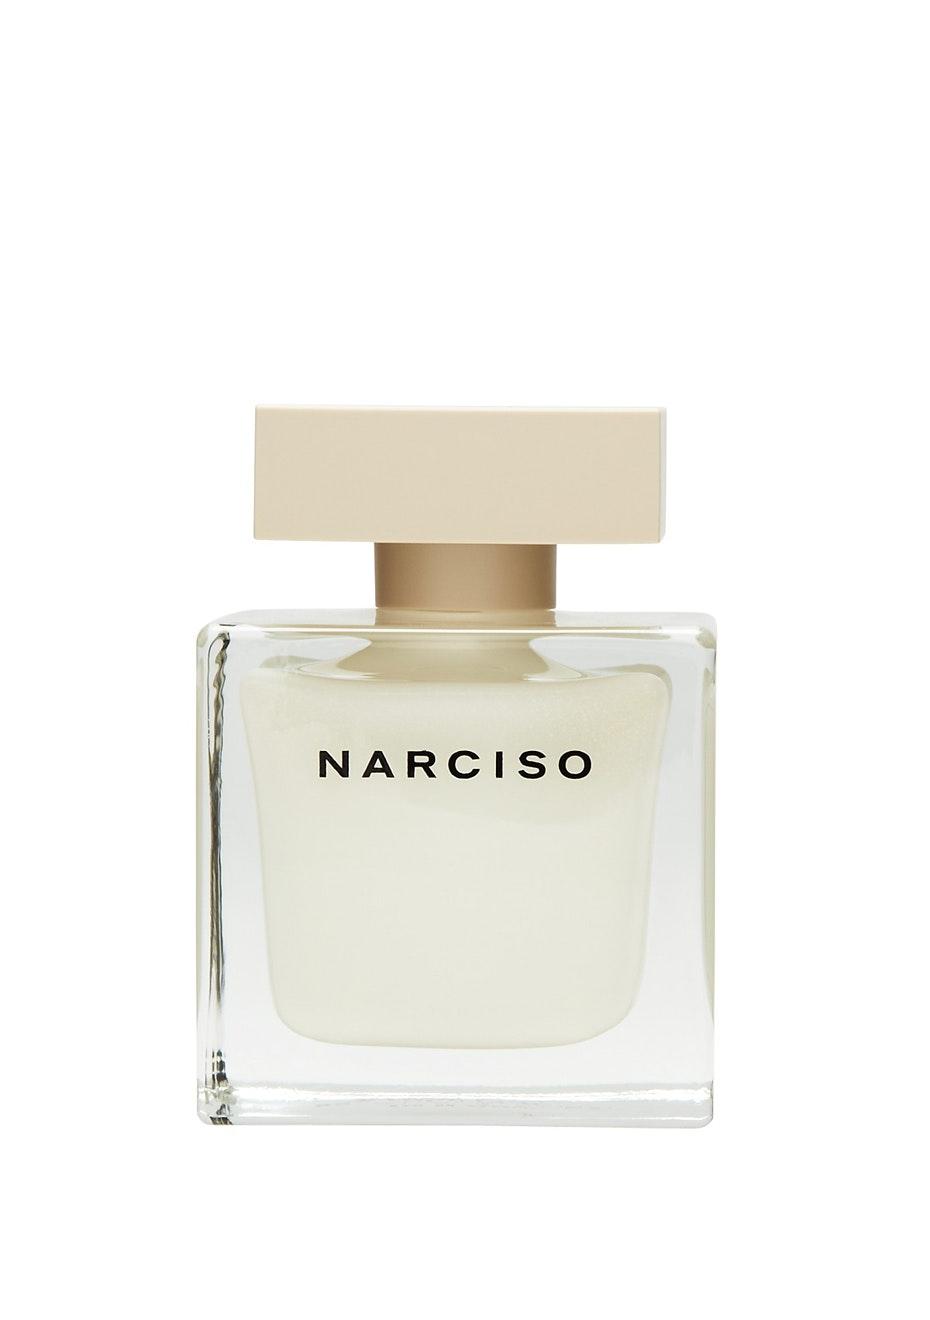 Narciso Rodriguez NARCISO EDP 50ml (W)